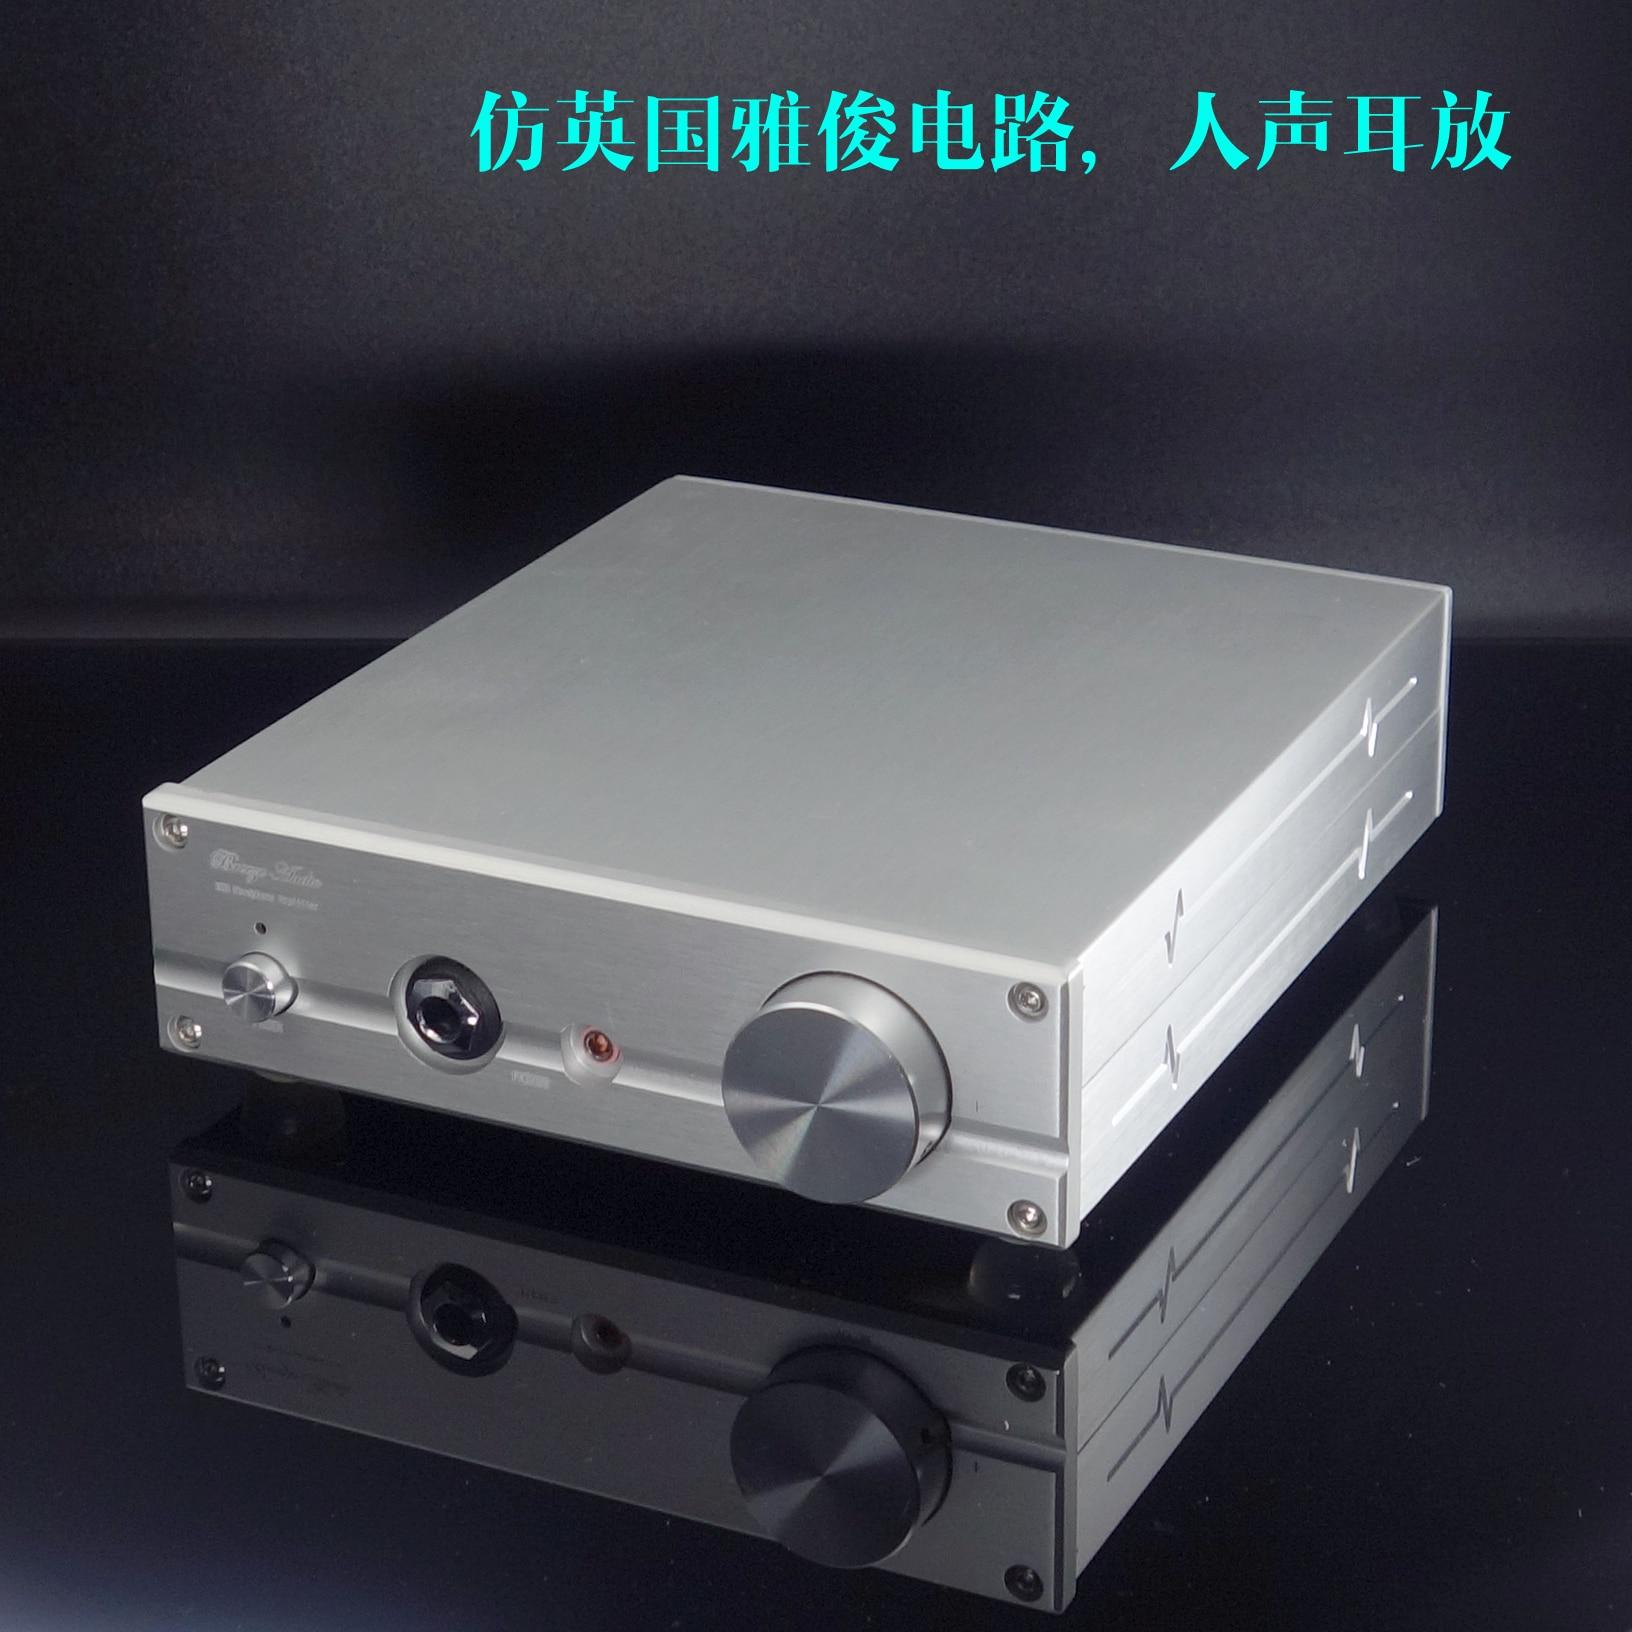 2019 Breeze Audio New E50 High Performance Headphone Audio Amplifier 800mw/32ohm2019 Breeze Audio New E50 High Performance Headphone Audio Amplifier 800mw/32ohm